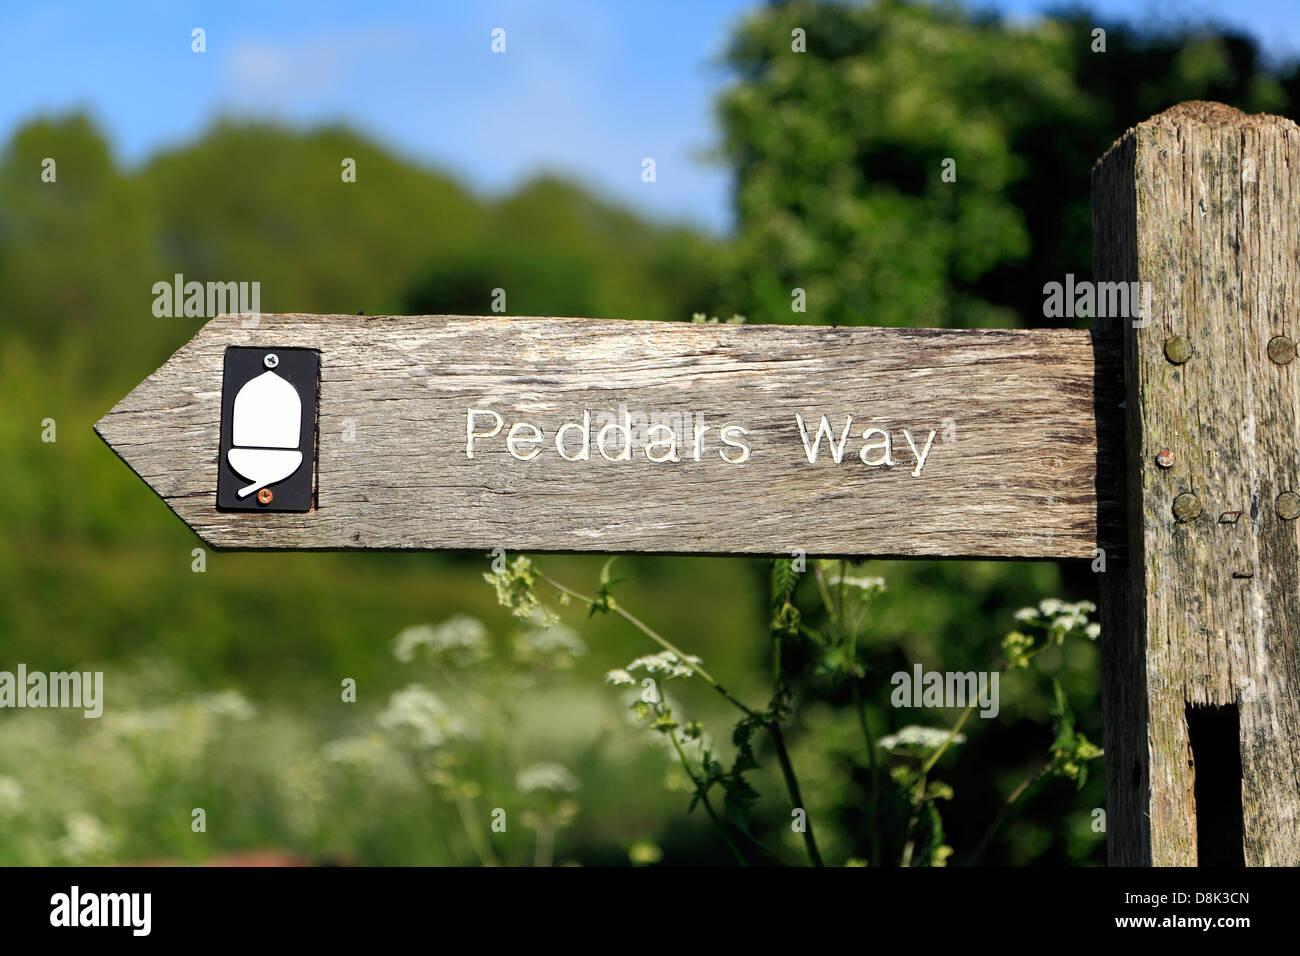 Peddars Way, fingerpost, Norfolk, signpost, sign, waymark, public footpath, England UK, signs - Stock Image